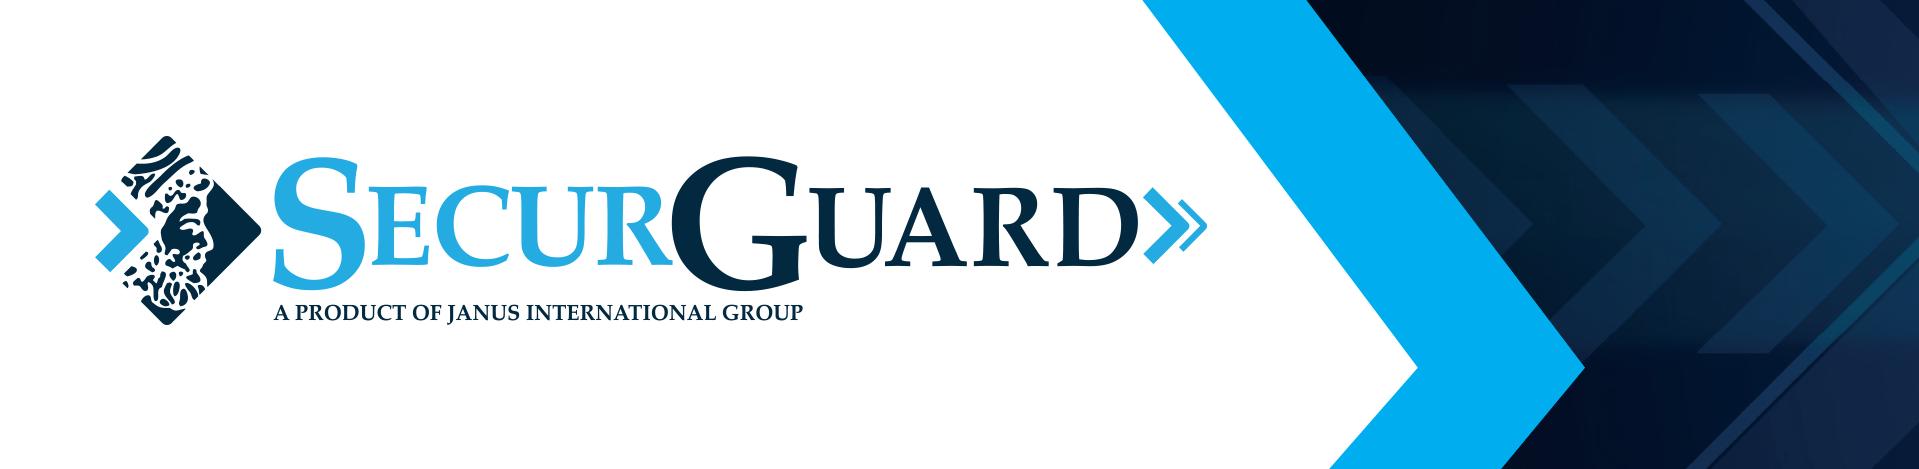 SecurGuard Smart Entry System by Janus International